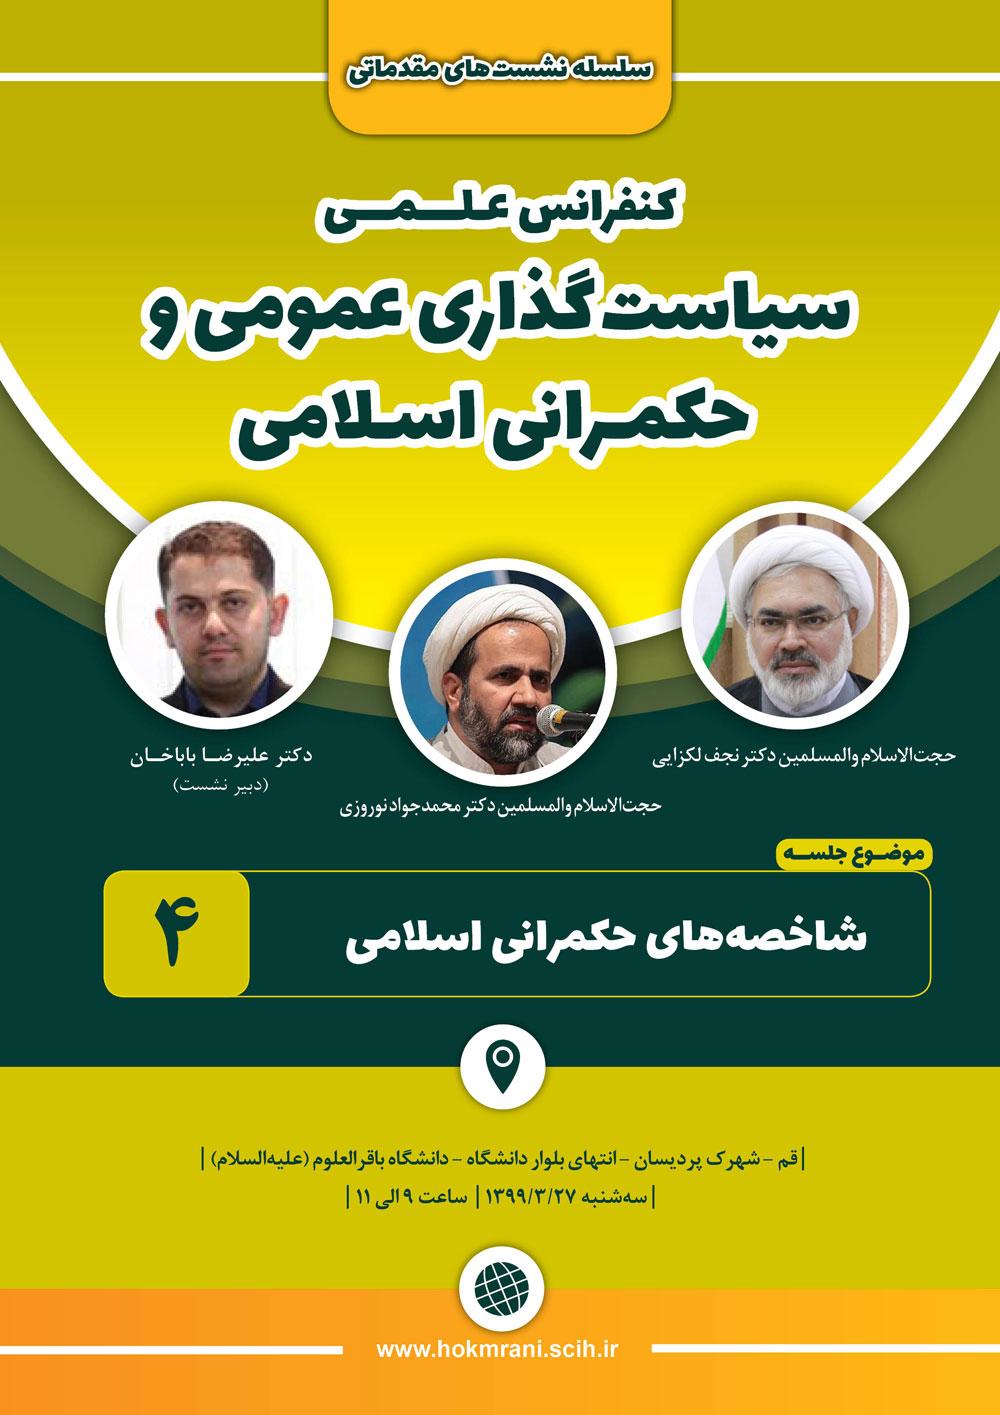 mizgerd49903241 - چهارمین نشست از سلسله نشستهای مقدماتی کنفرانس علمی سیاستگذاری عمومی و حکمرانی اسلامی برگزار میشود